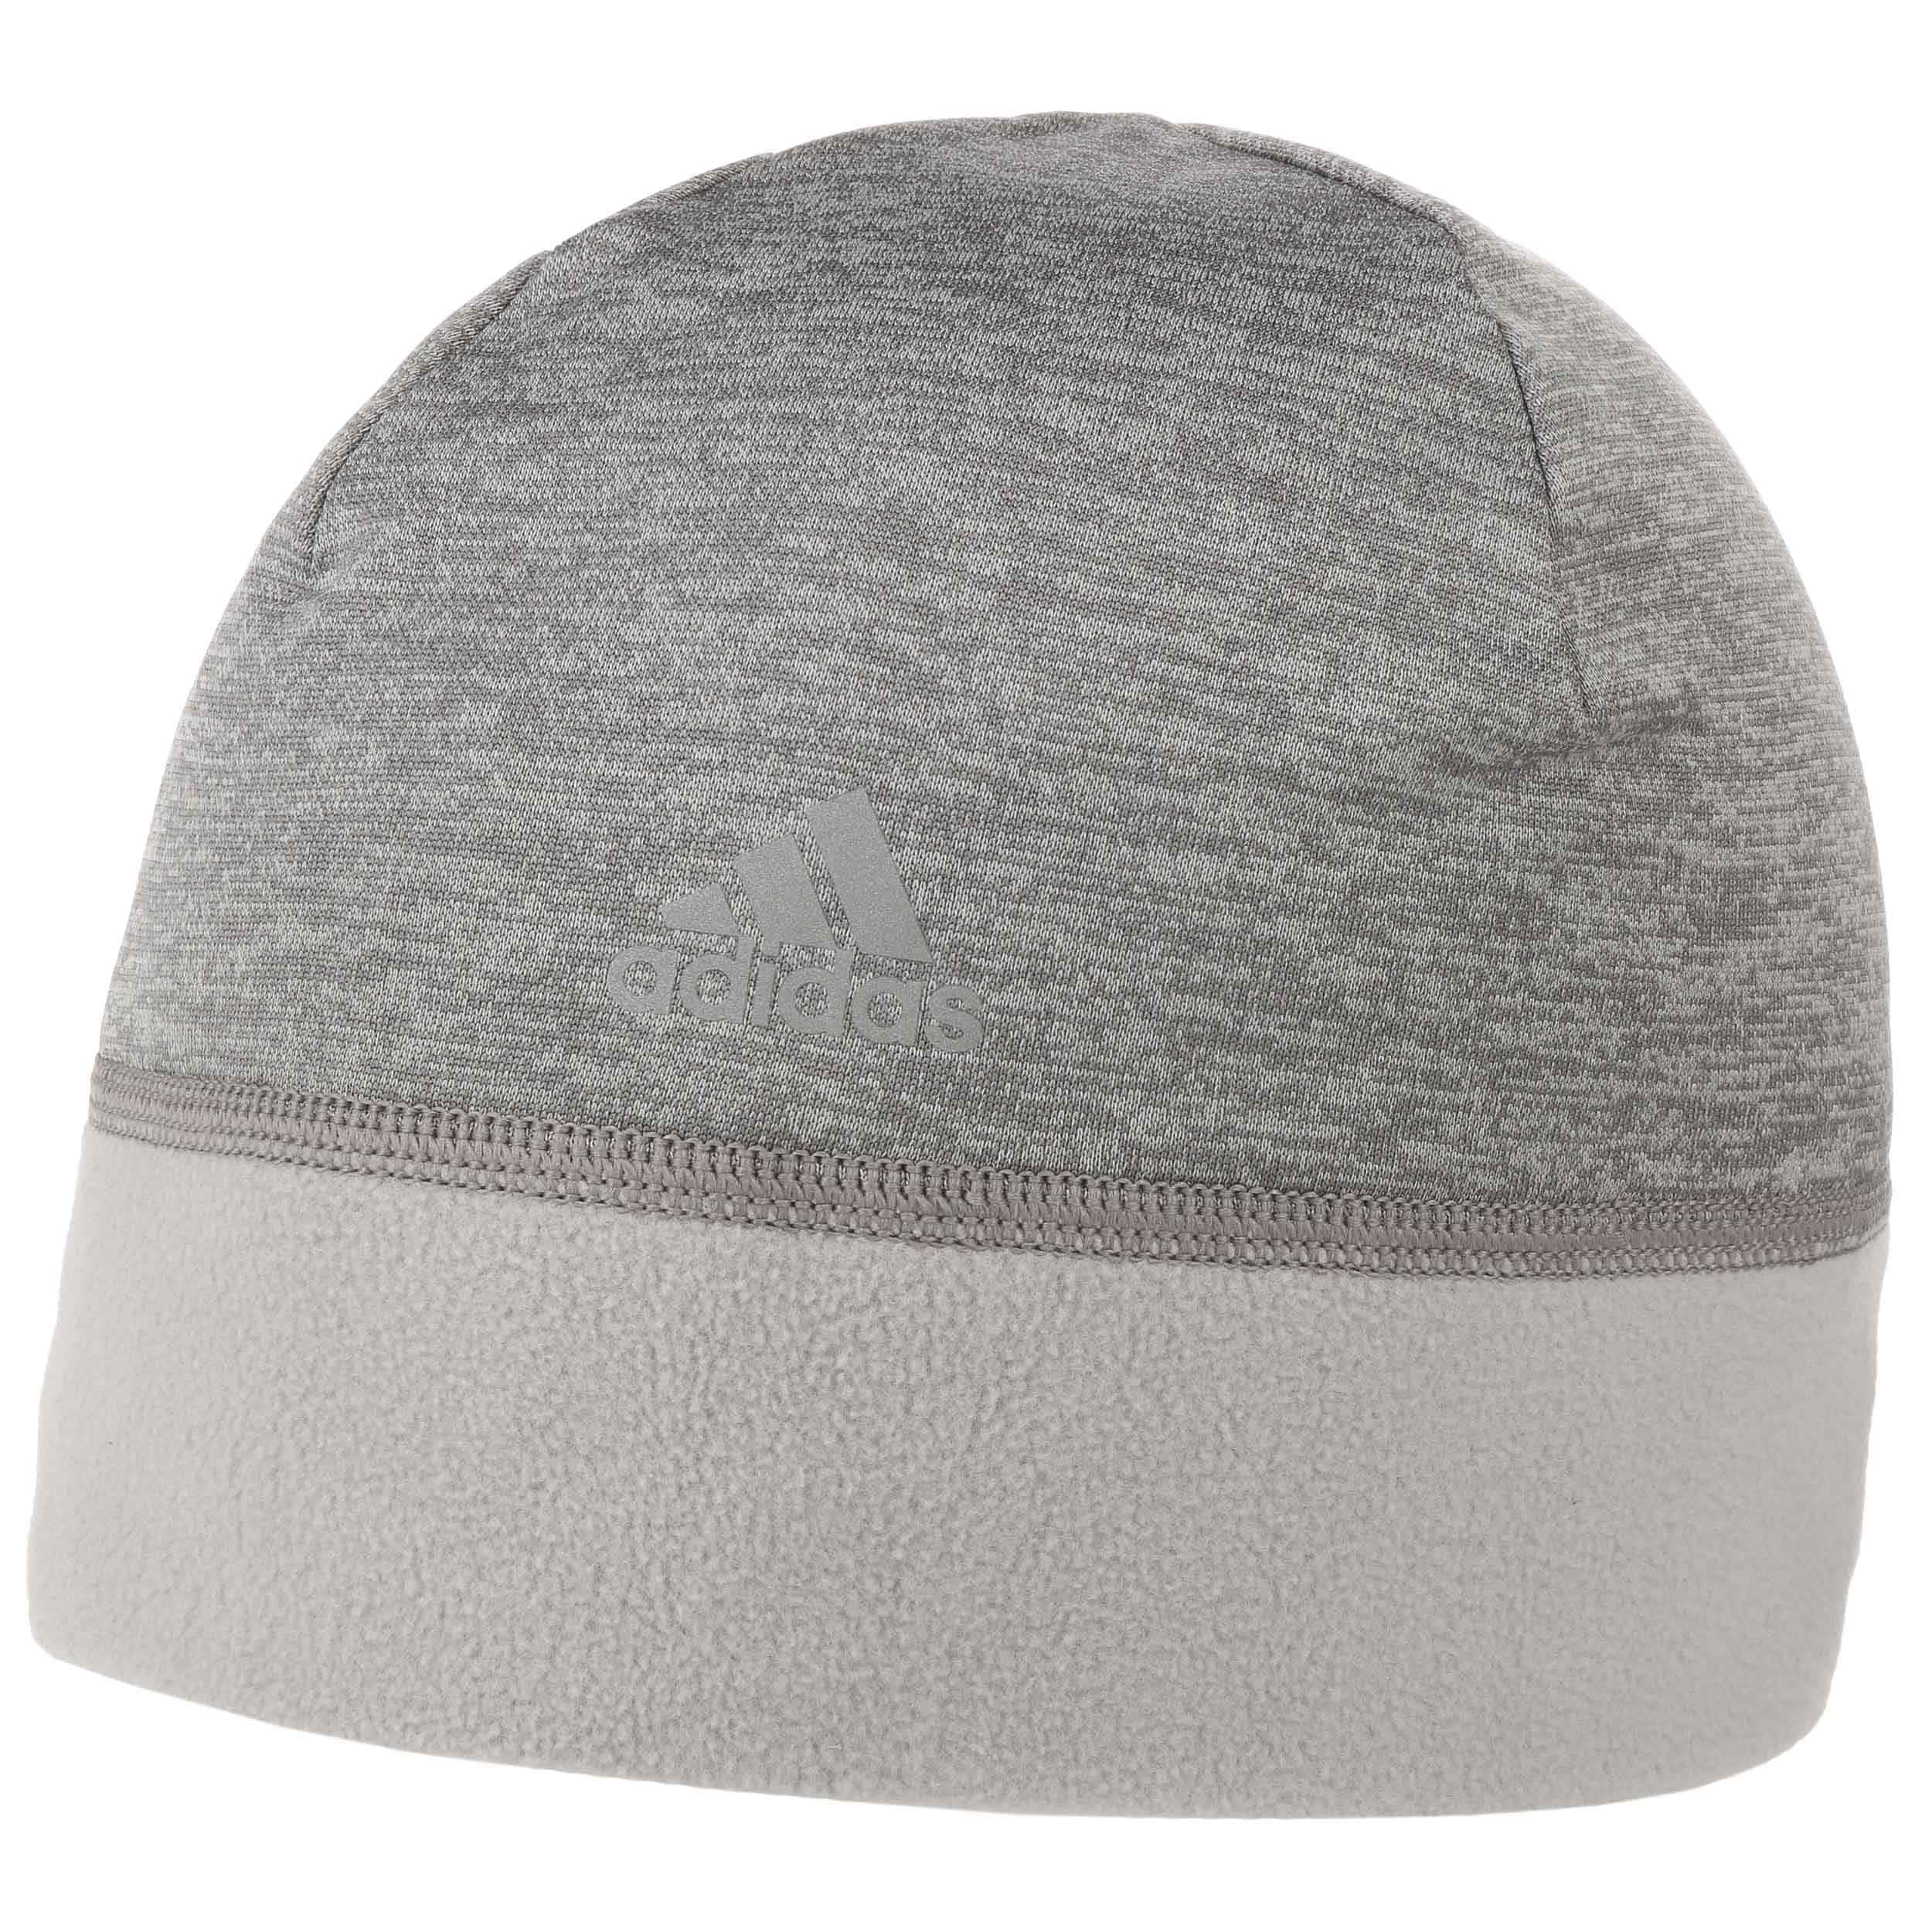 Climawarm Beanie Hat. by adidas 973e2b658